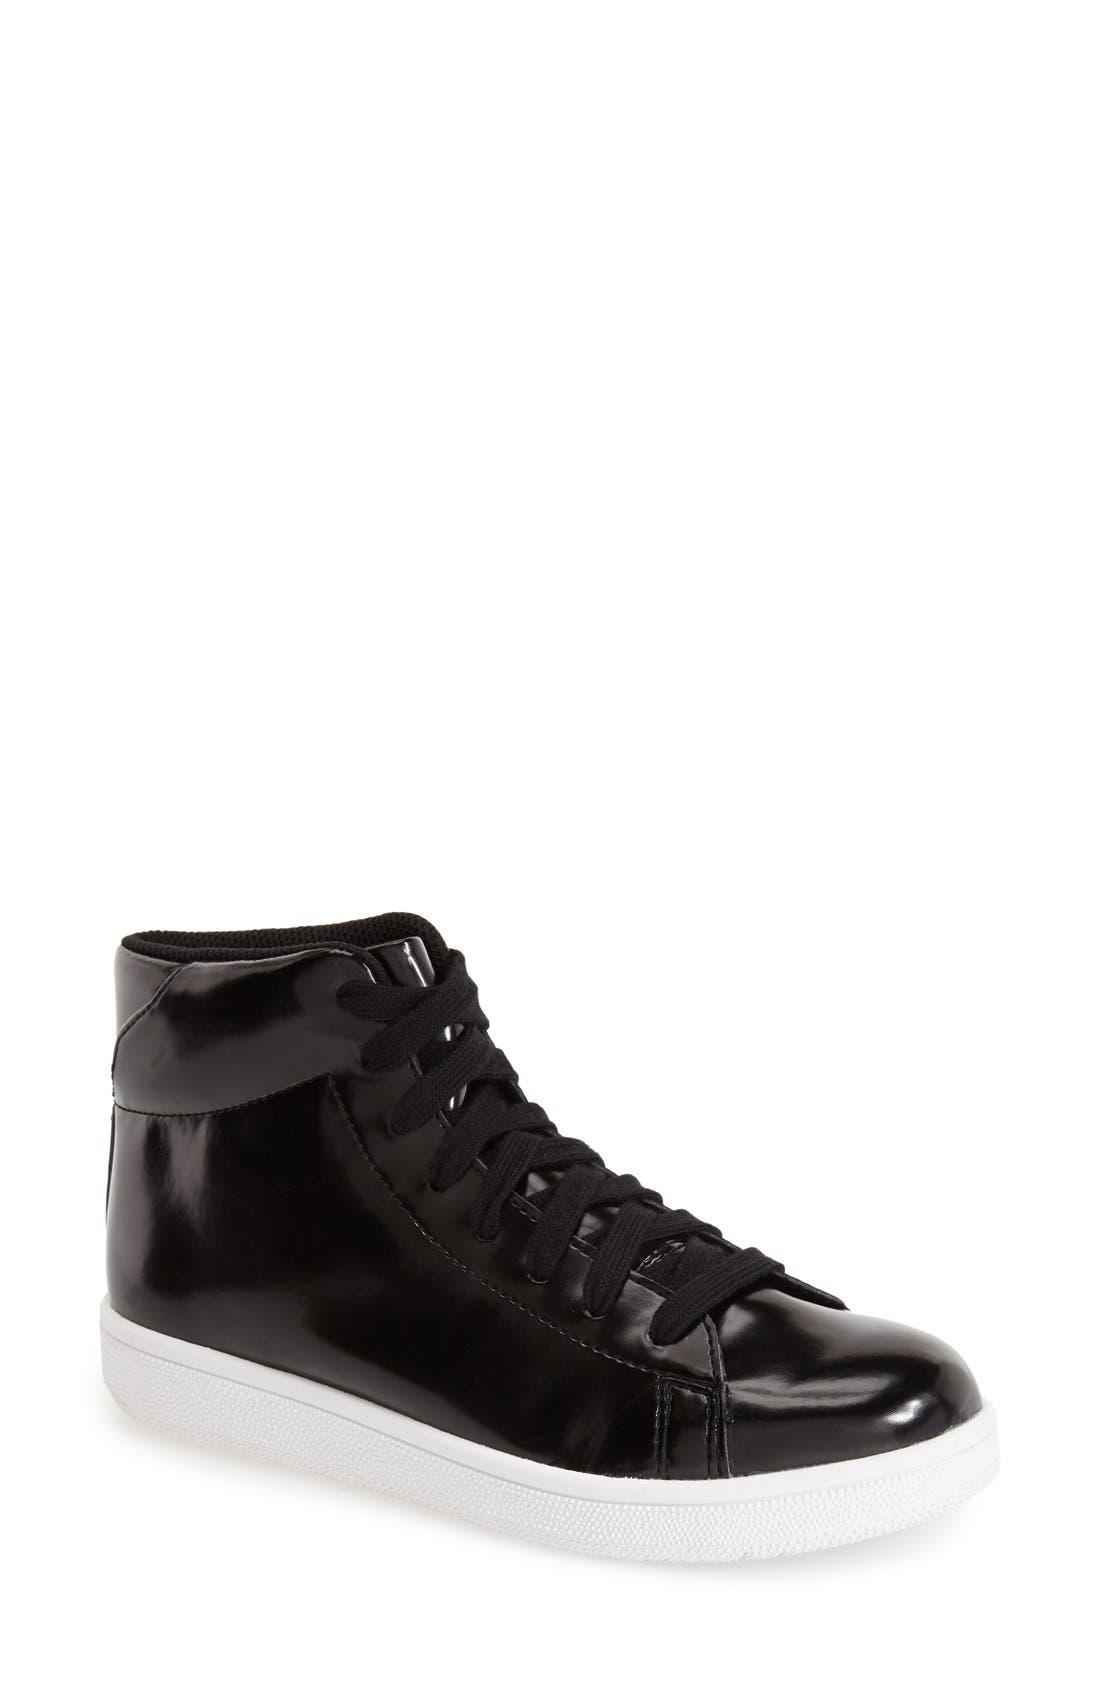 Main Image - Jeffrey Campbell 'Player' High Top Sneaker (Women)